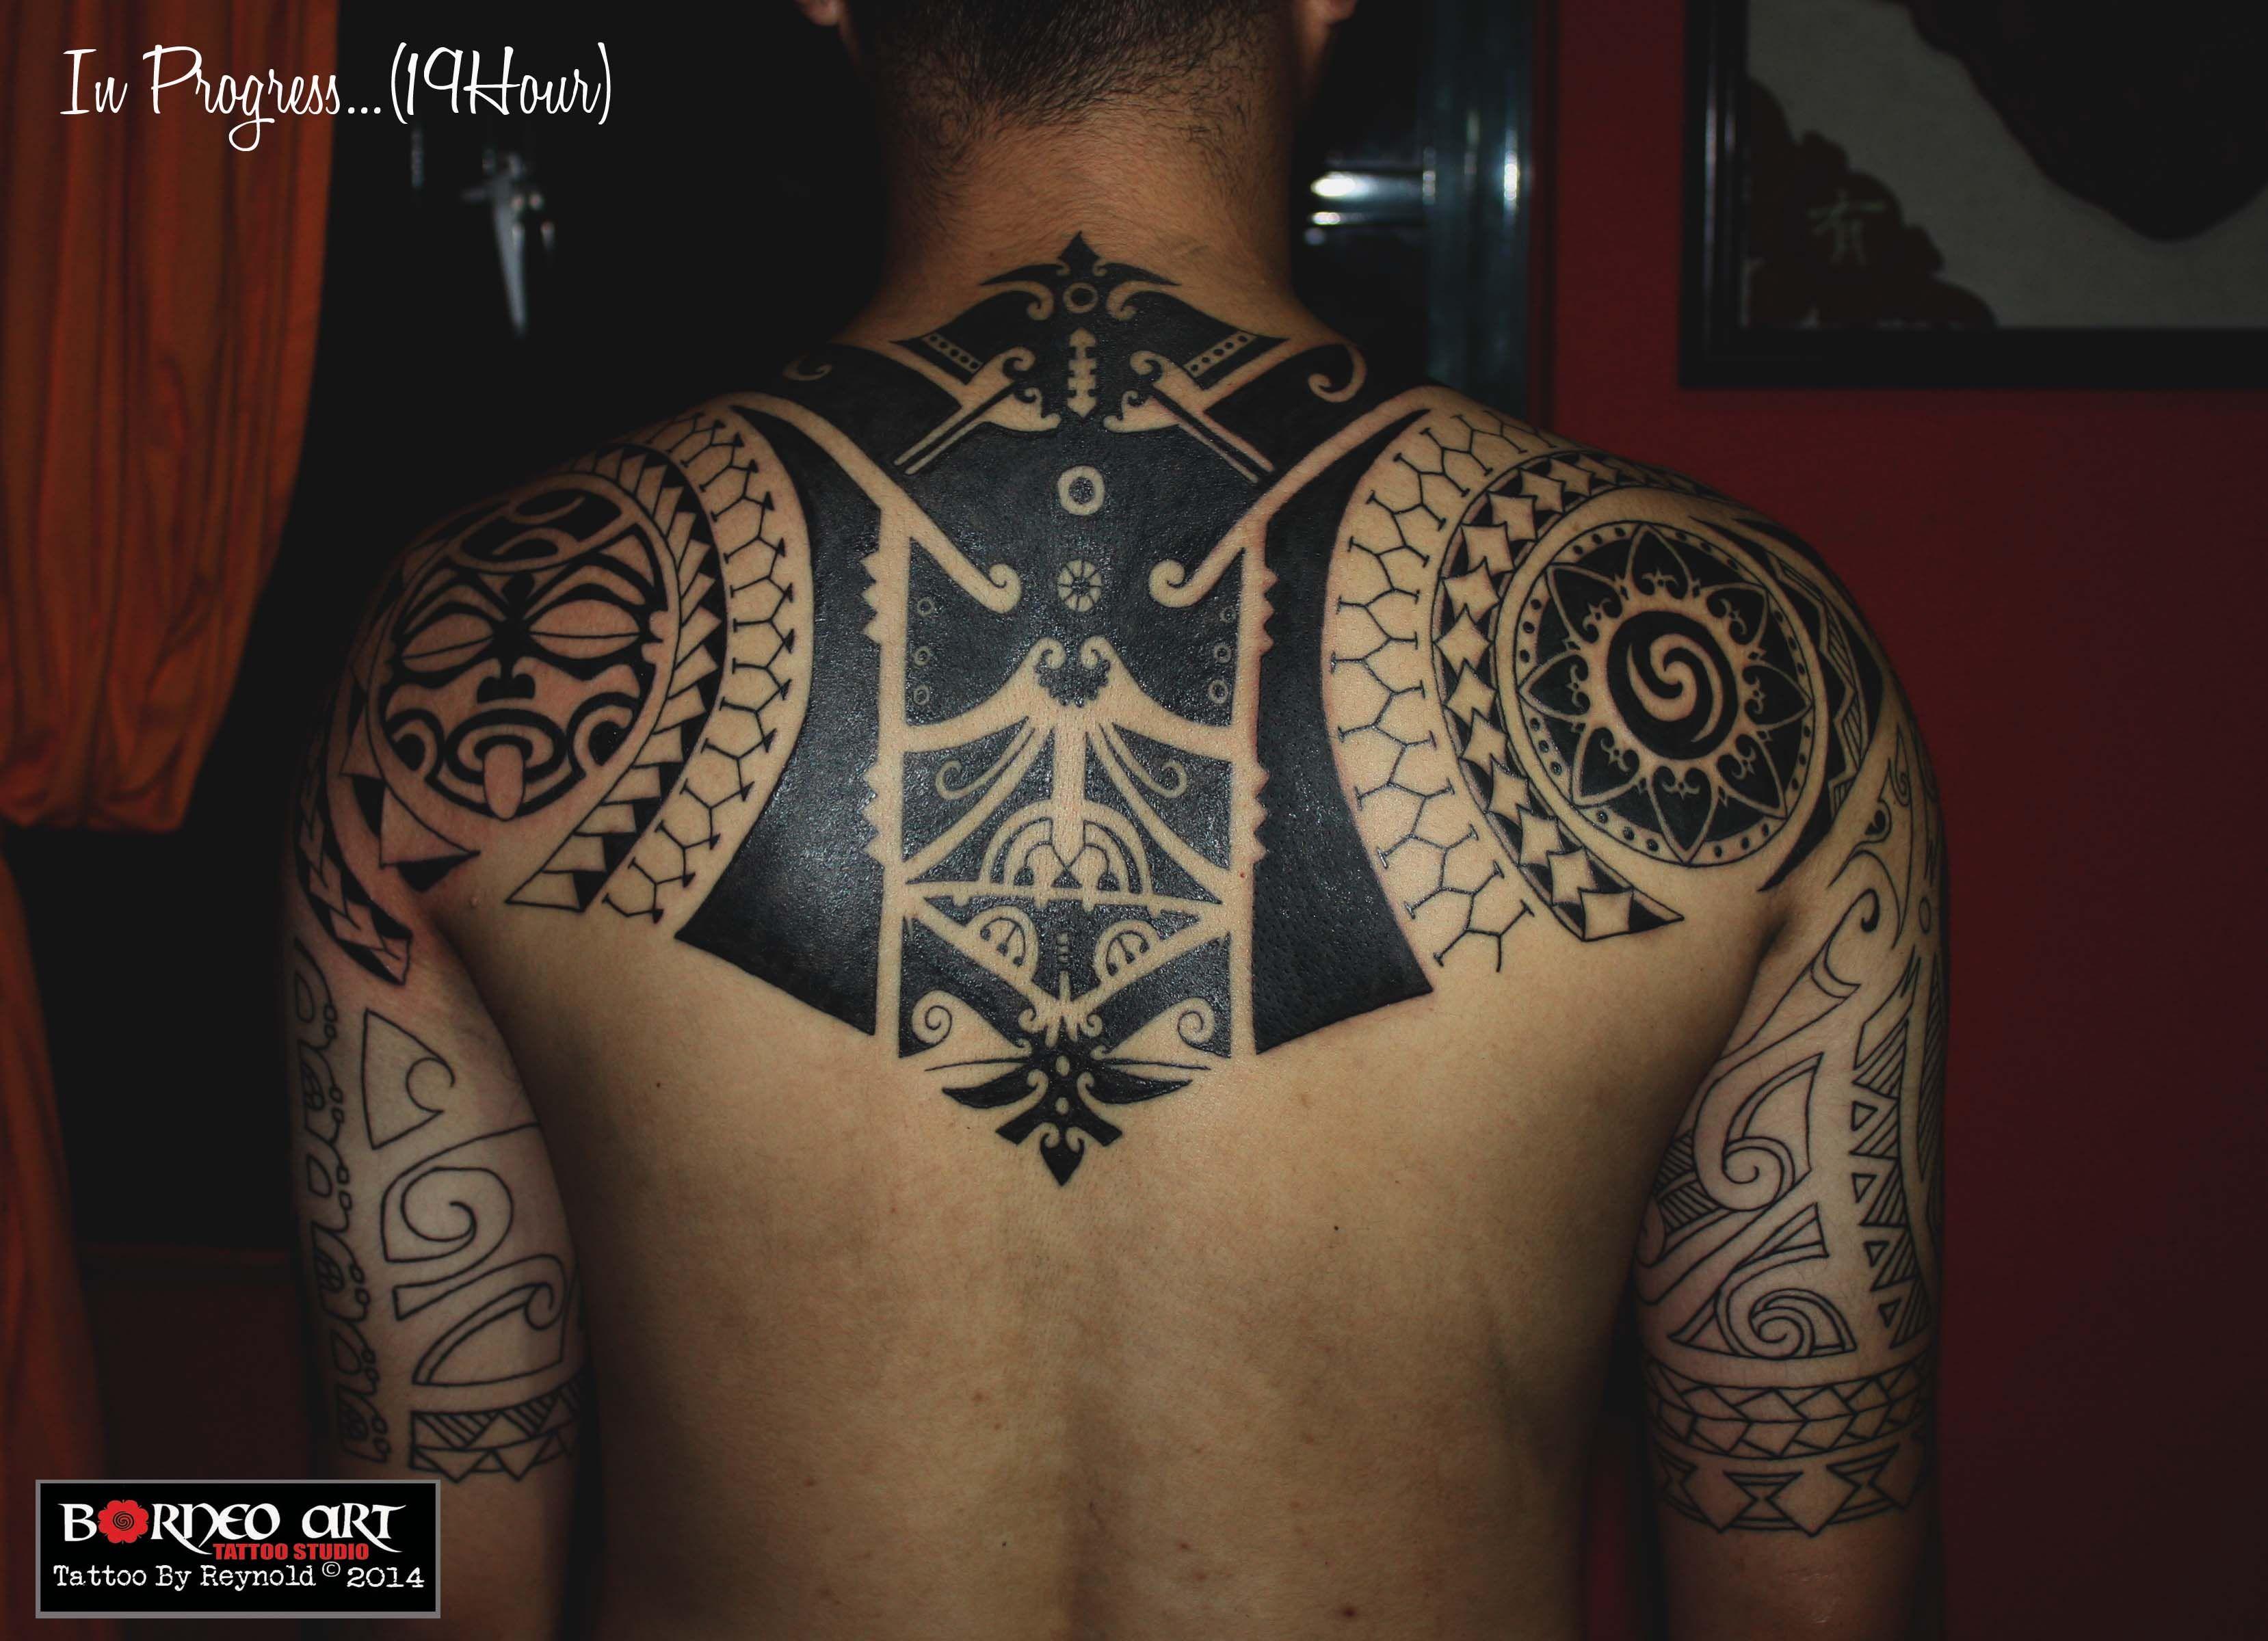 Marquesan Tattoo: Design Inspired By Borneo,maori,polynesian And Marquesan